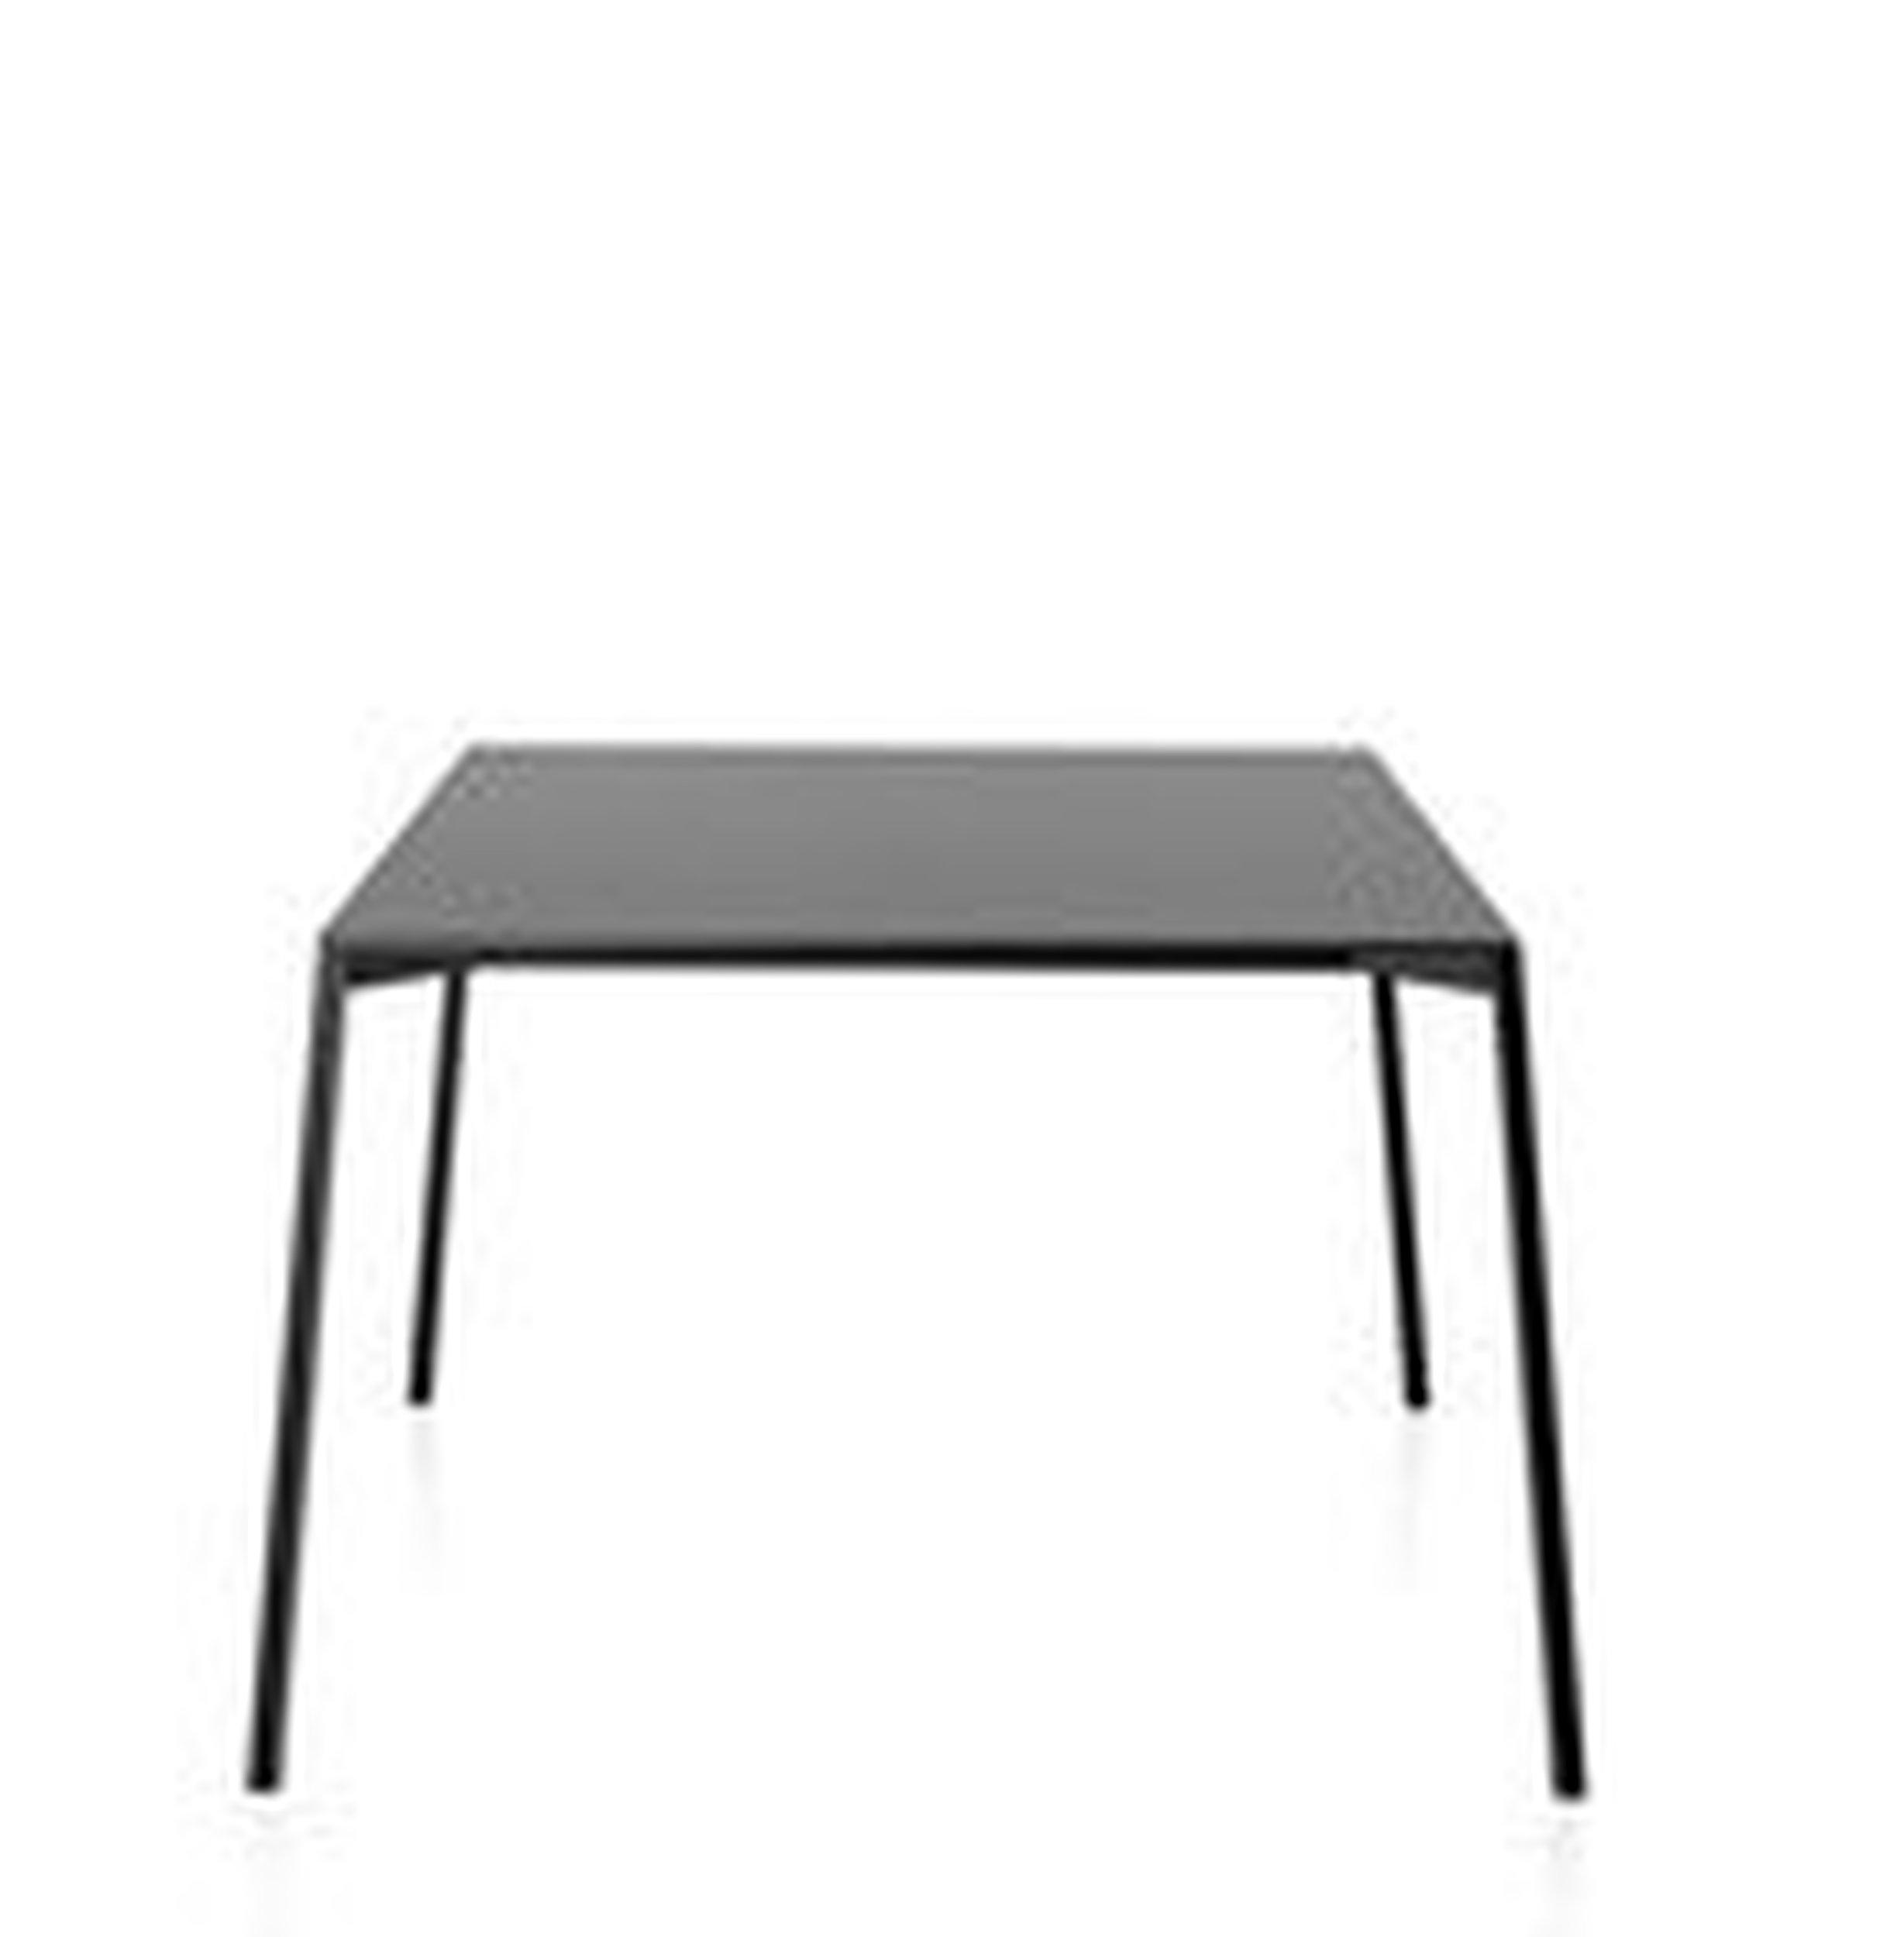 Stół Table_One 220 x 100 cm czarny blat z czarną ramą